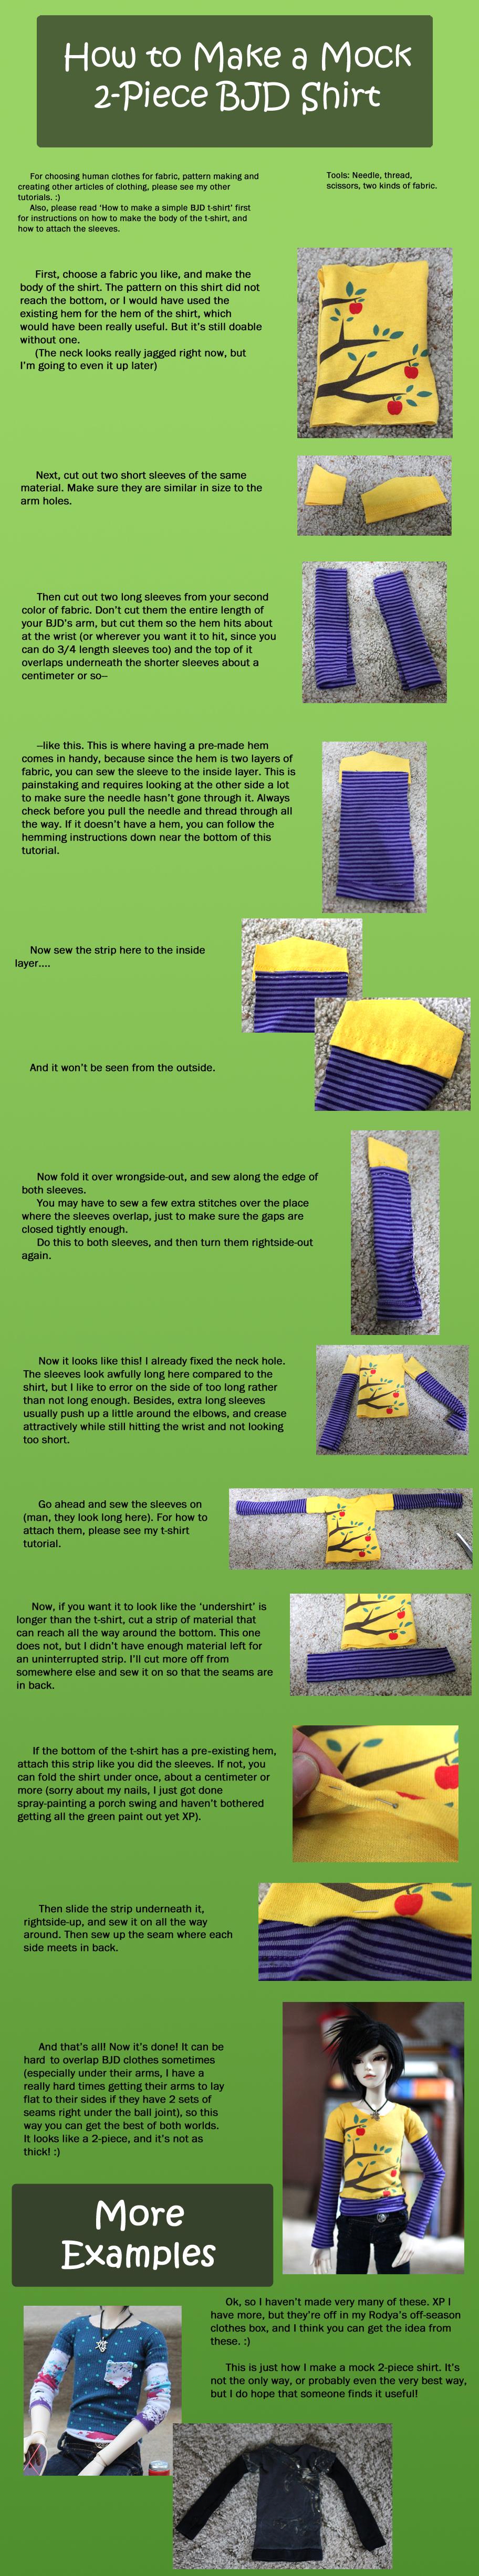 http://orig05.deviantart.net/57d0/f/2013/186/3/8/mock_2_piece_bjd_shirt_tutorial_by_rodianangel-d6c37t4.jpg